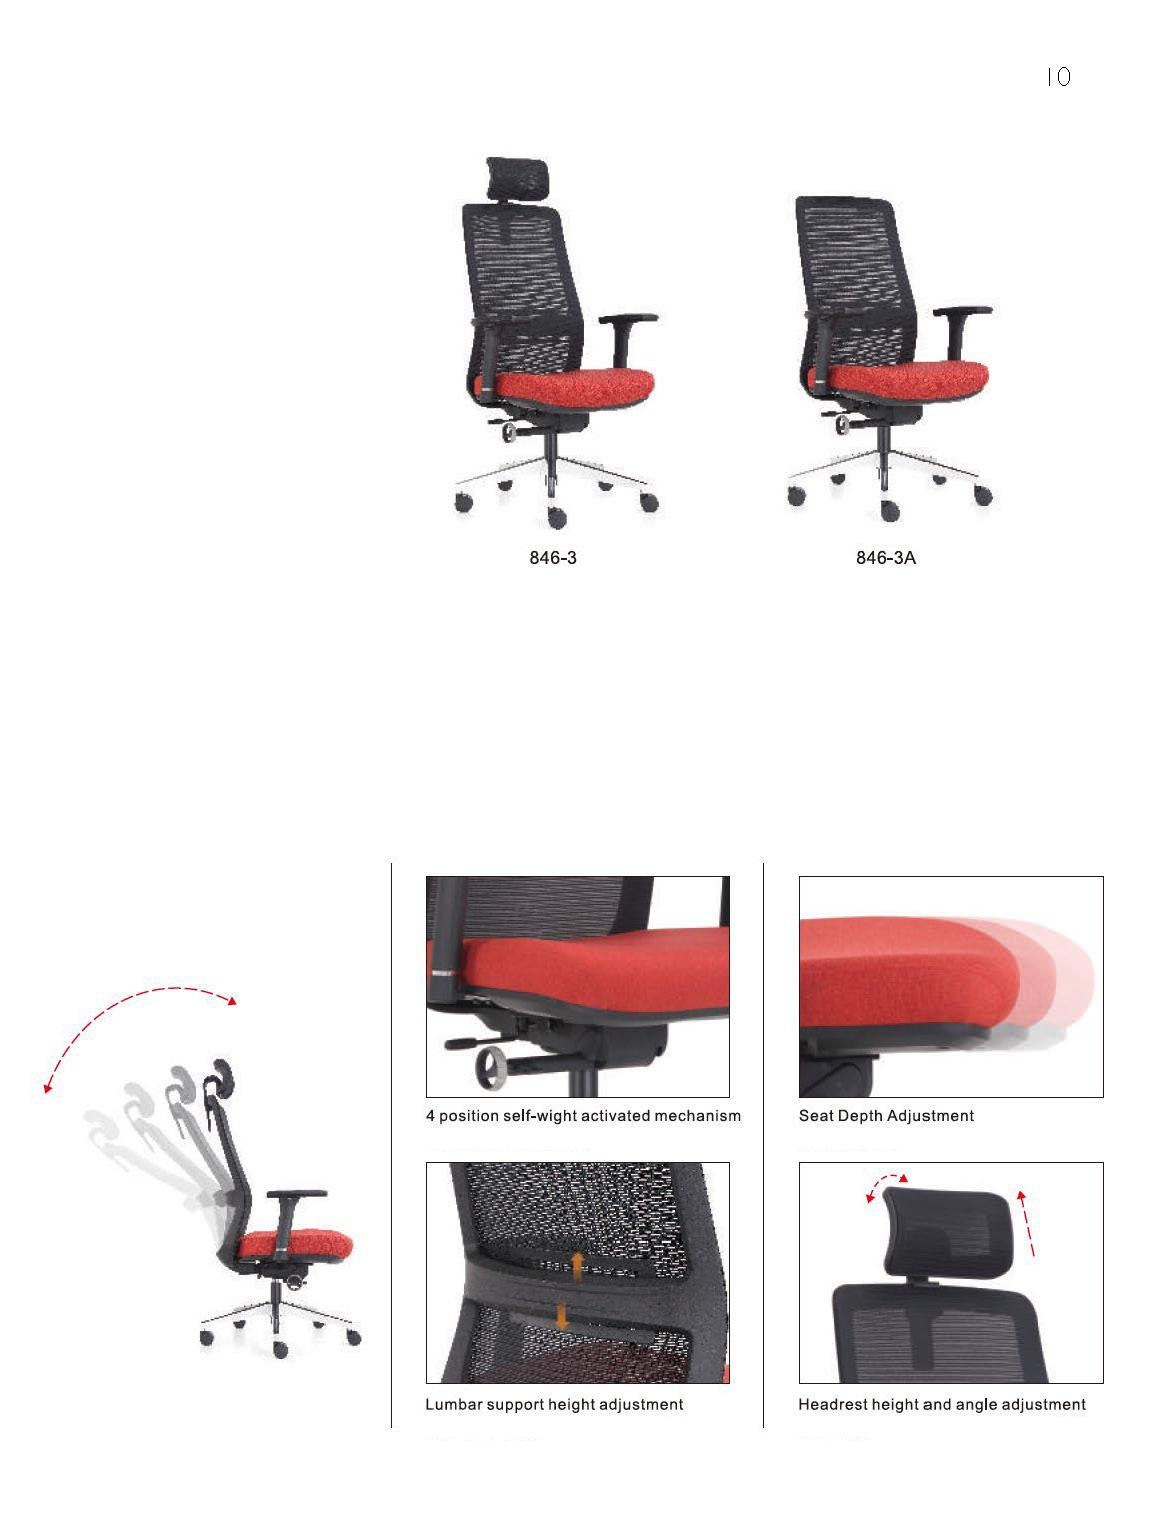 Top Furniture Catalog 2019_Page_10.jpg